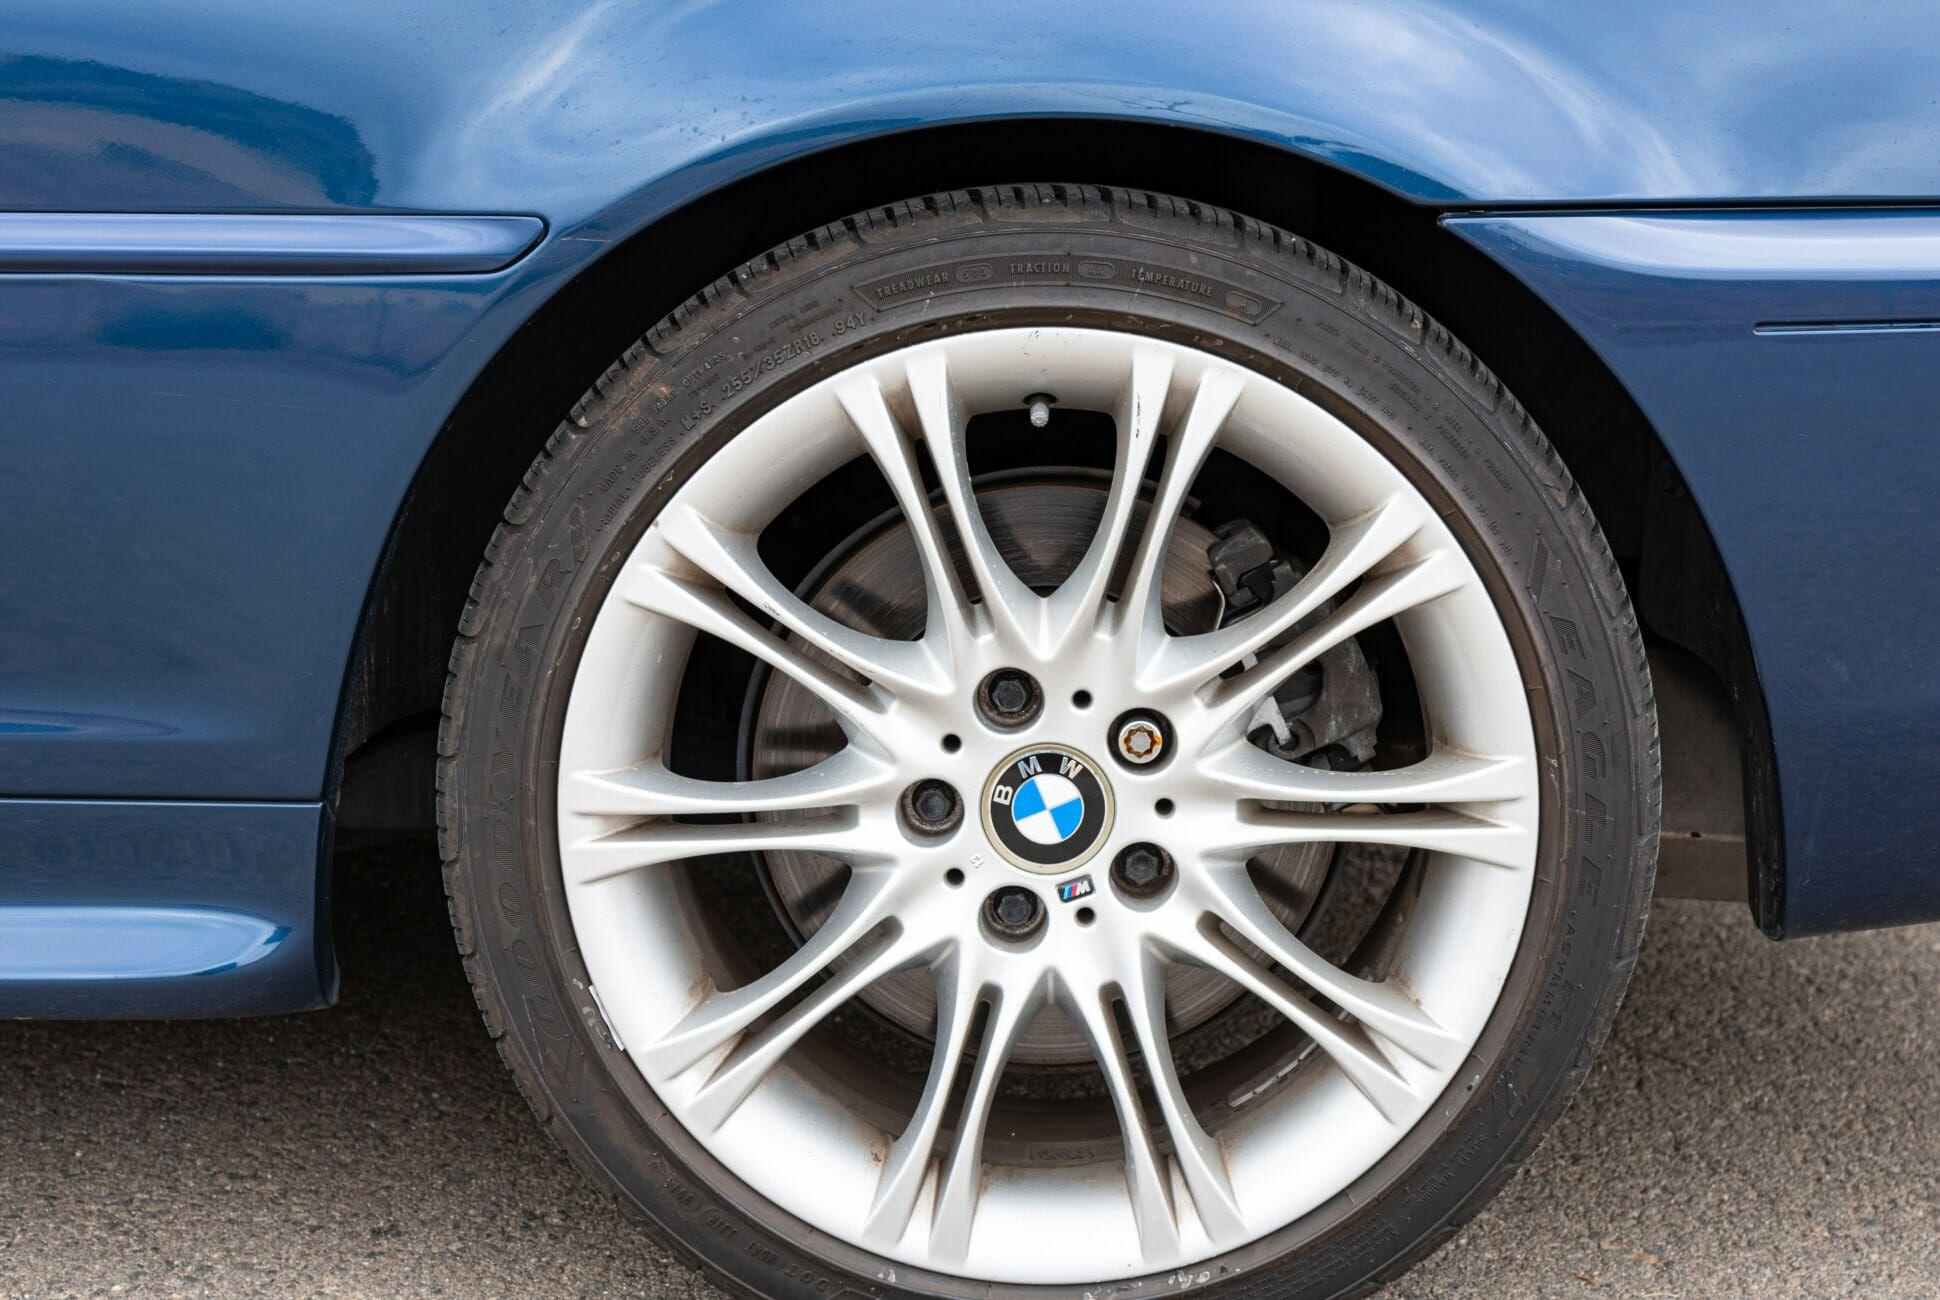 2004-BMW-330Ci-ZHP-6-Speed-gear-patrol-slide-02